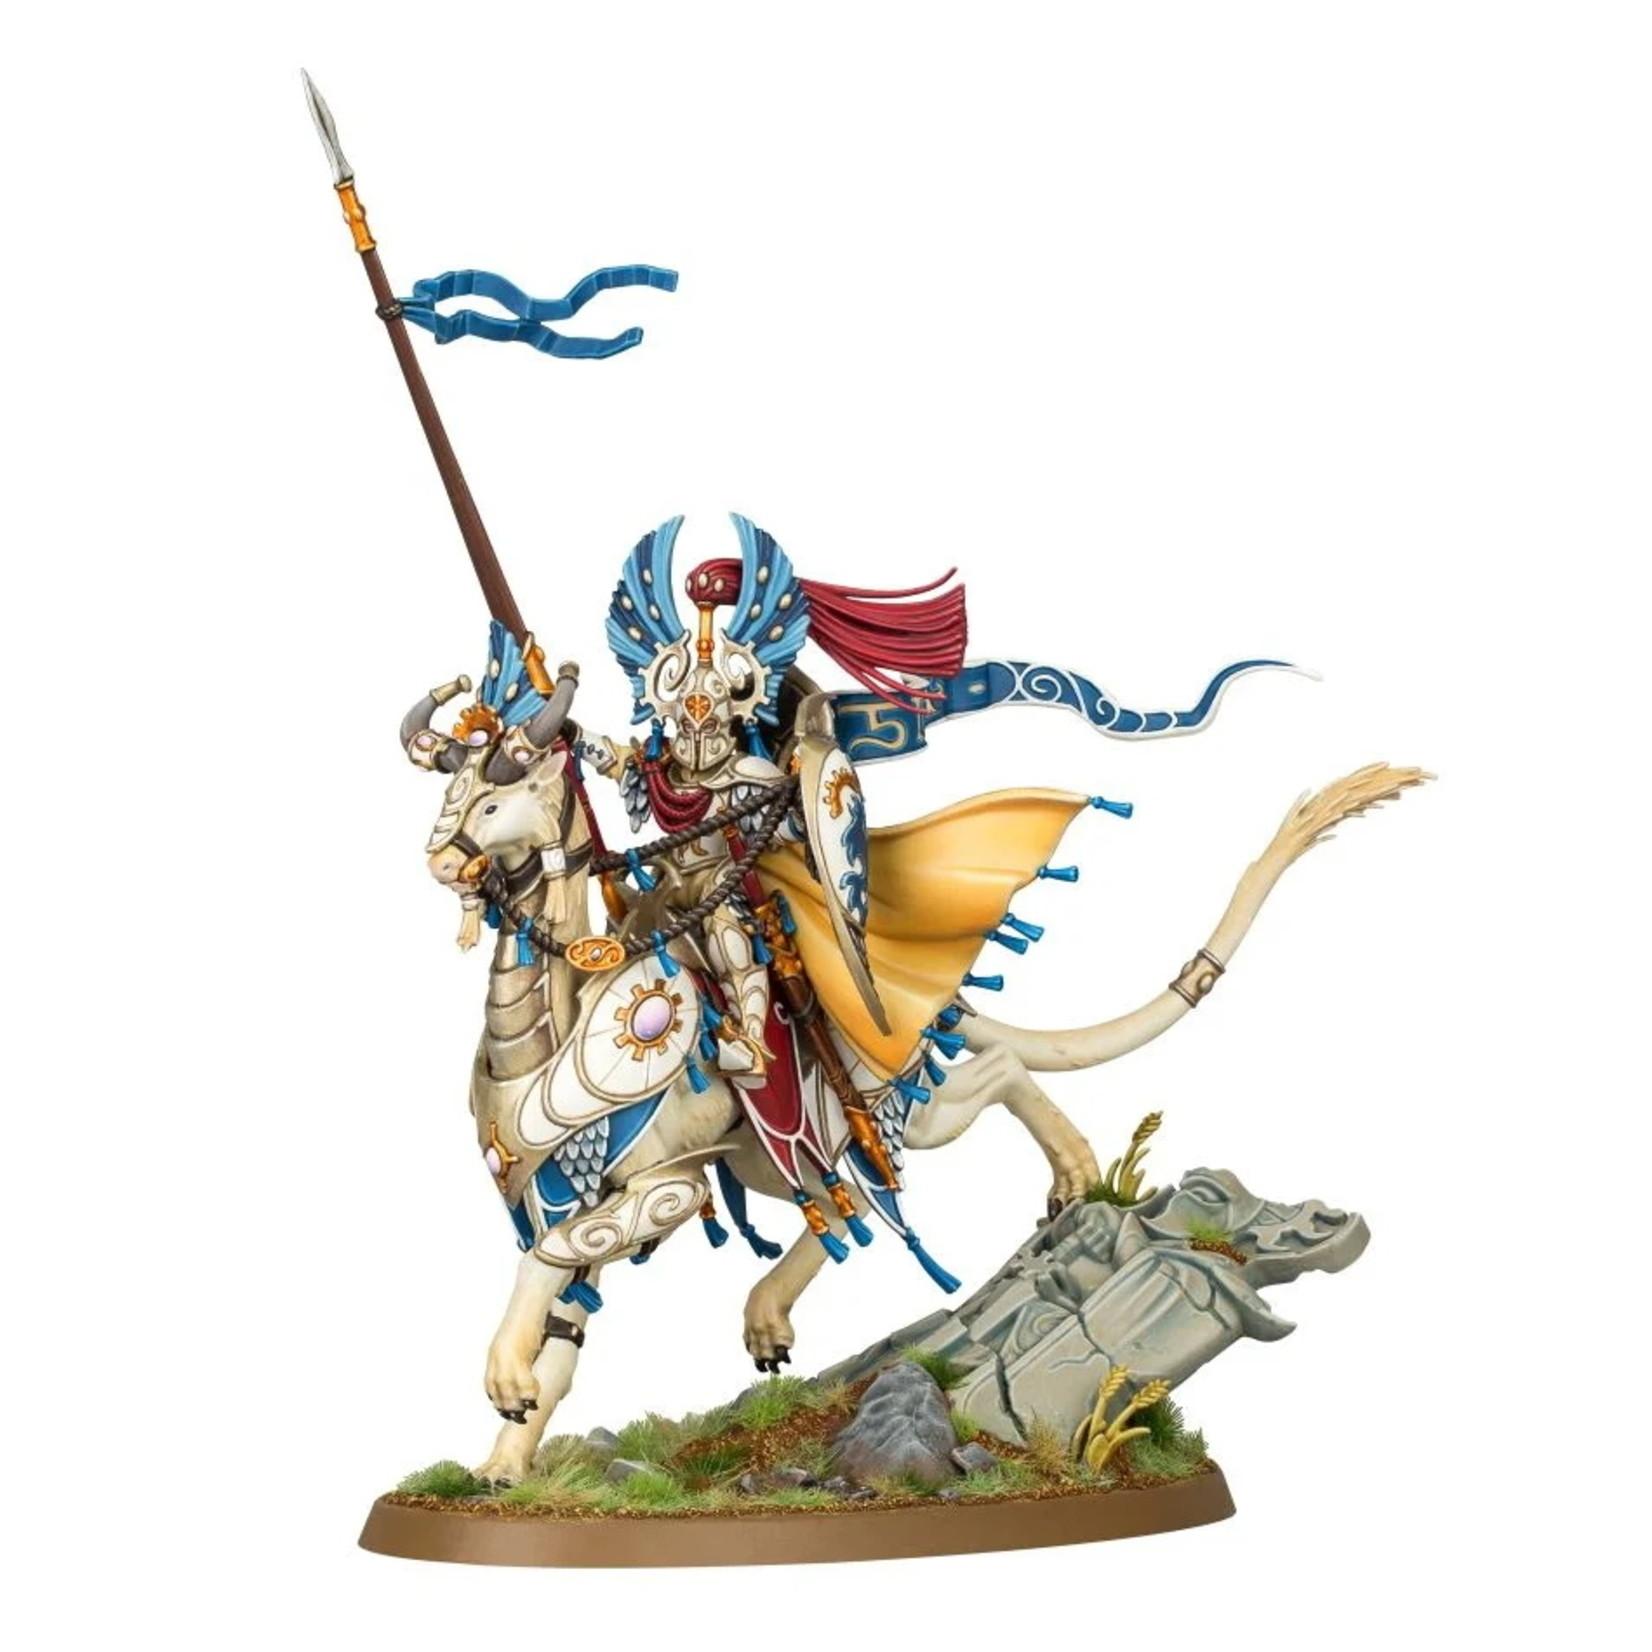 Games Workshop Lyrior Uthralle, Warden of Ymetrica